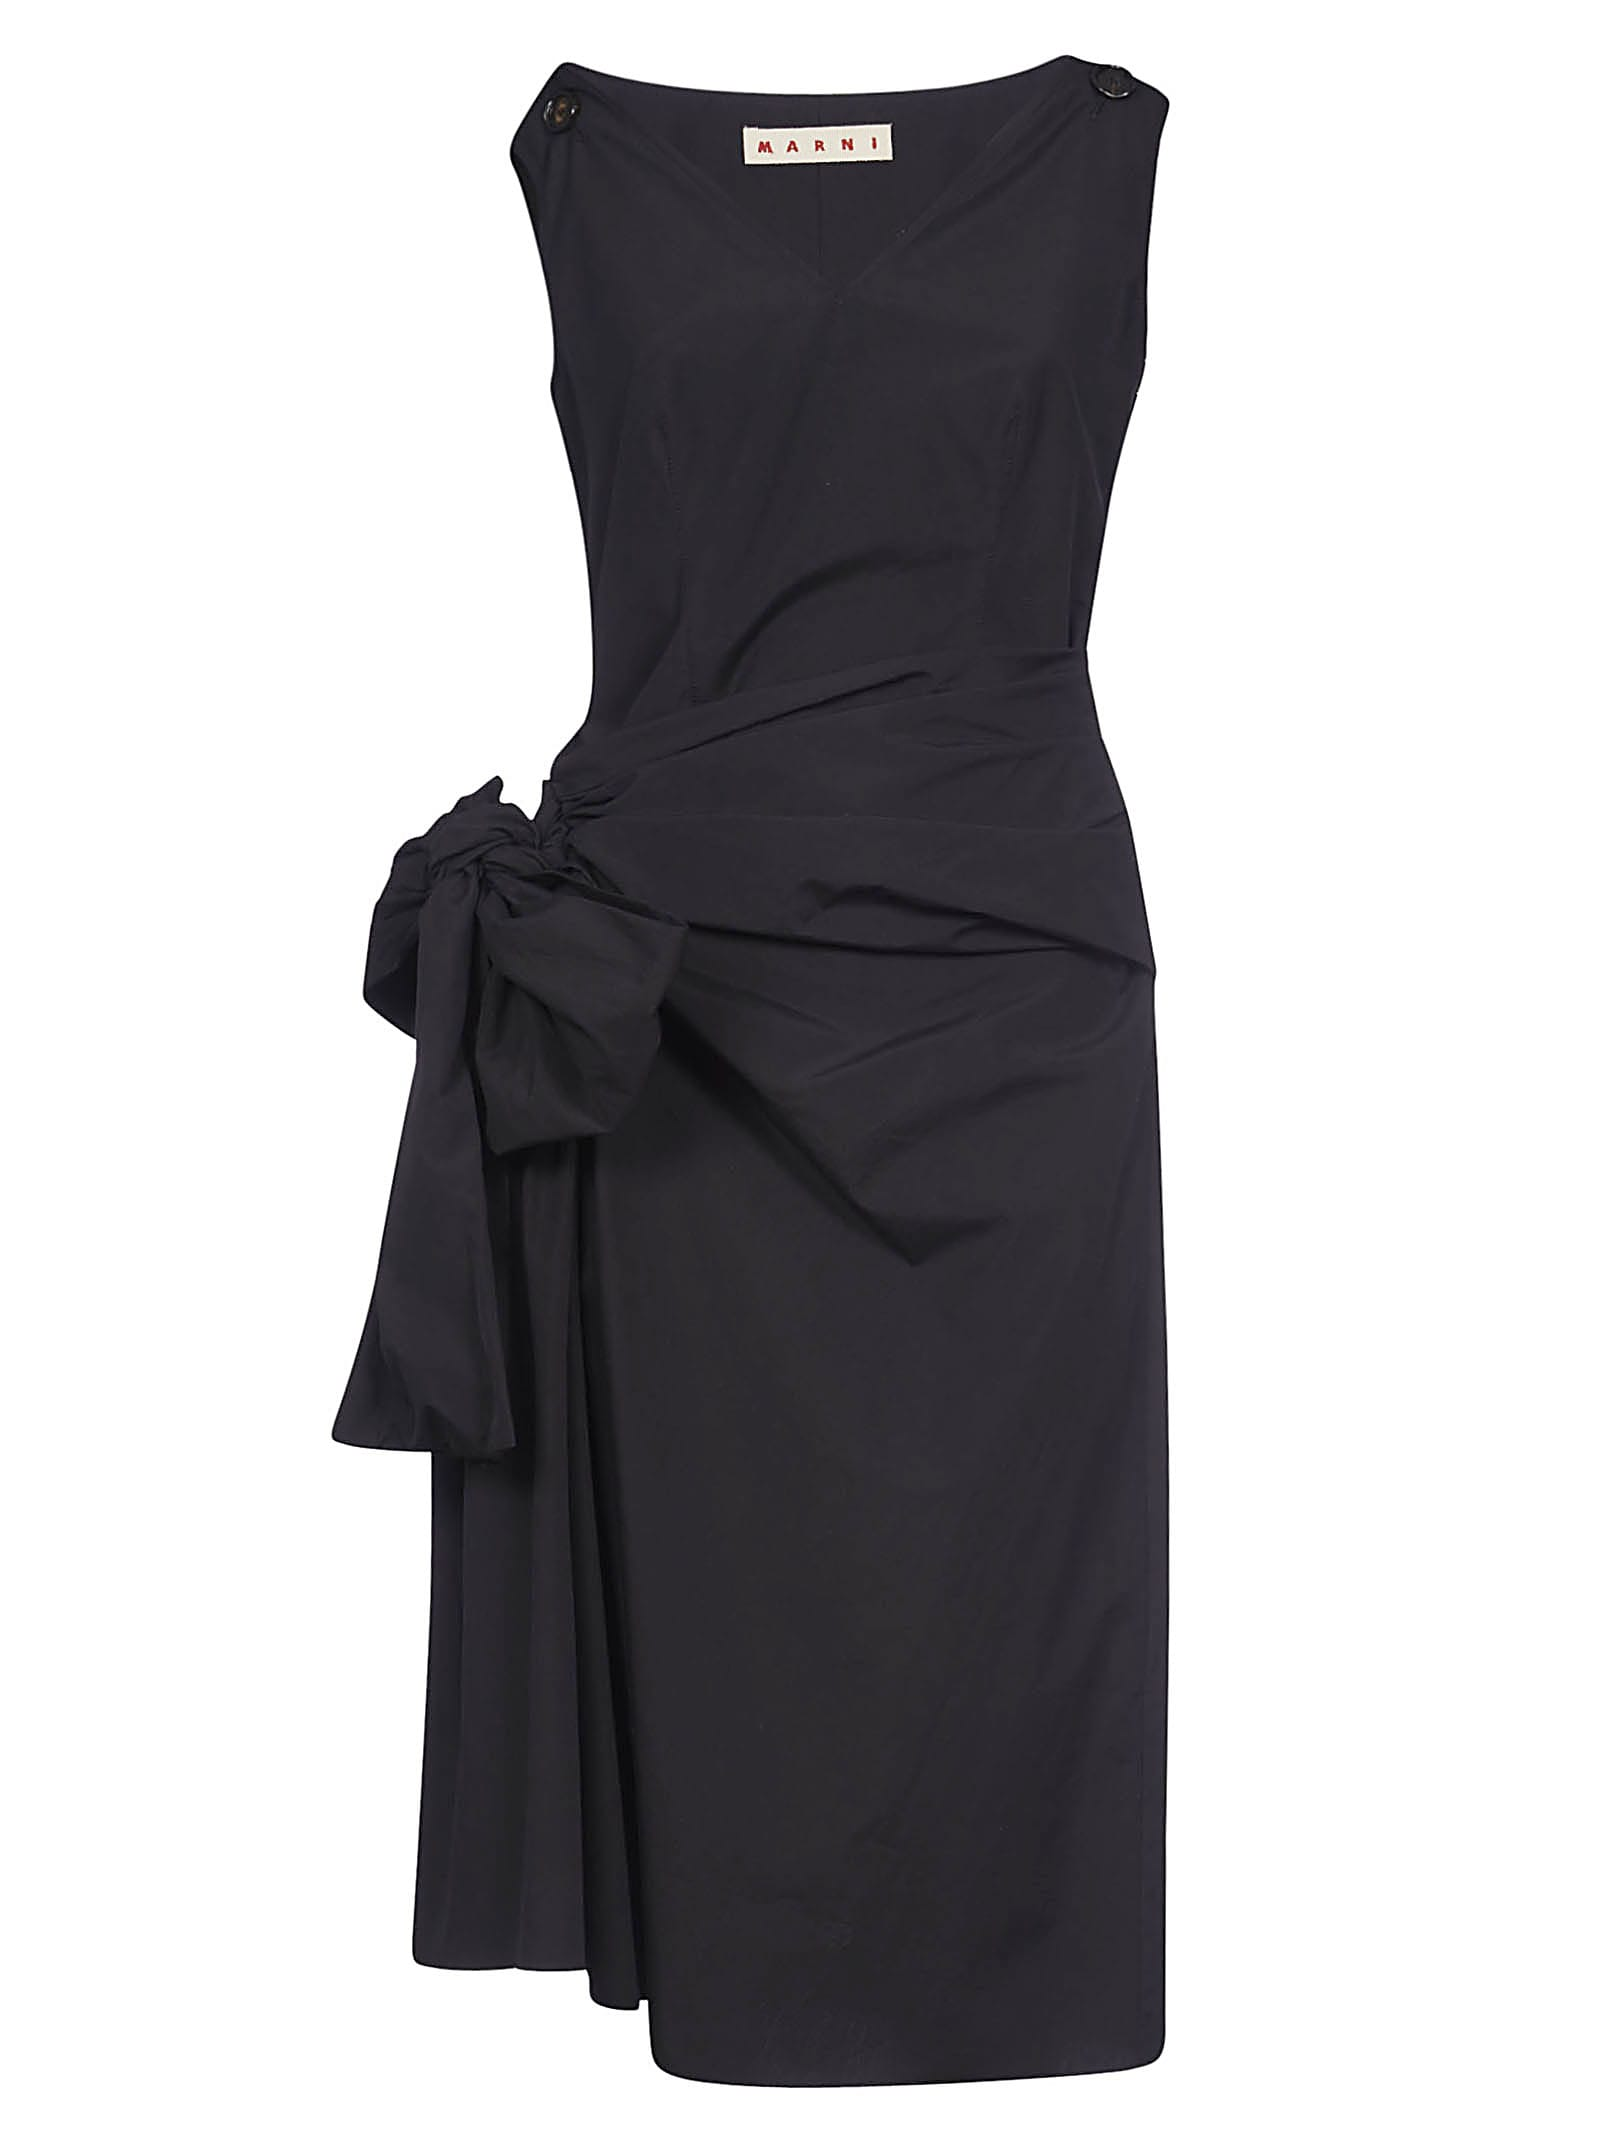 Buy Marni Sleeveless V-neck Gathered Dress online, shop Marni with free shipping